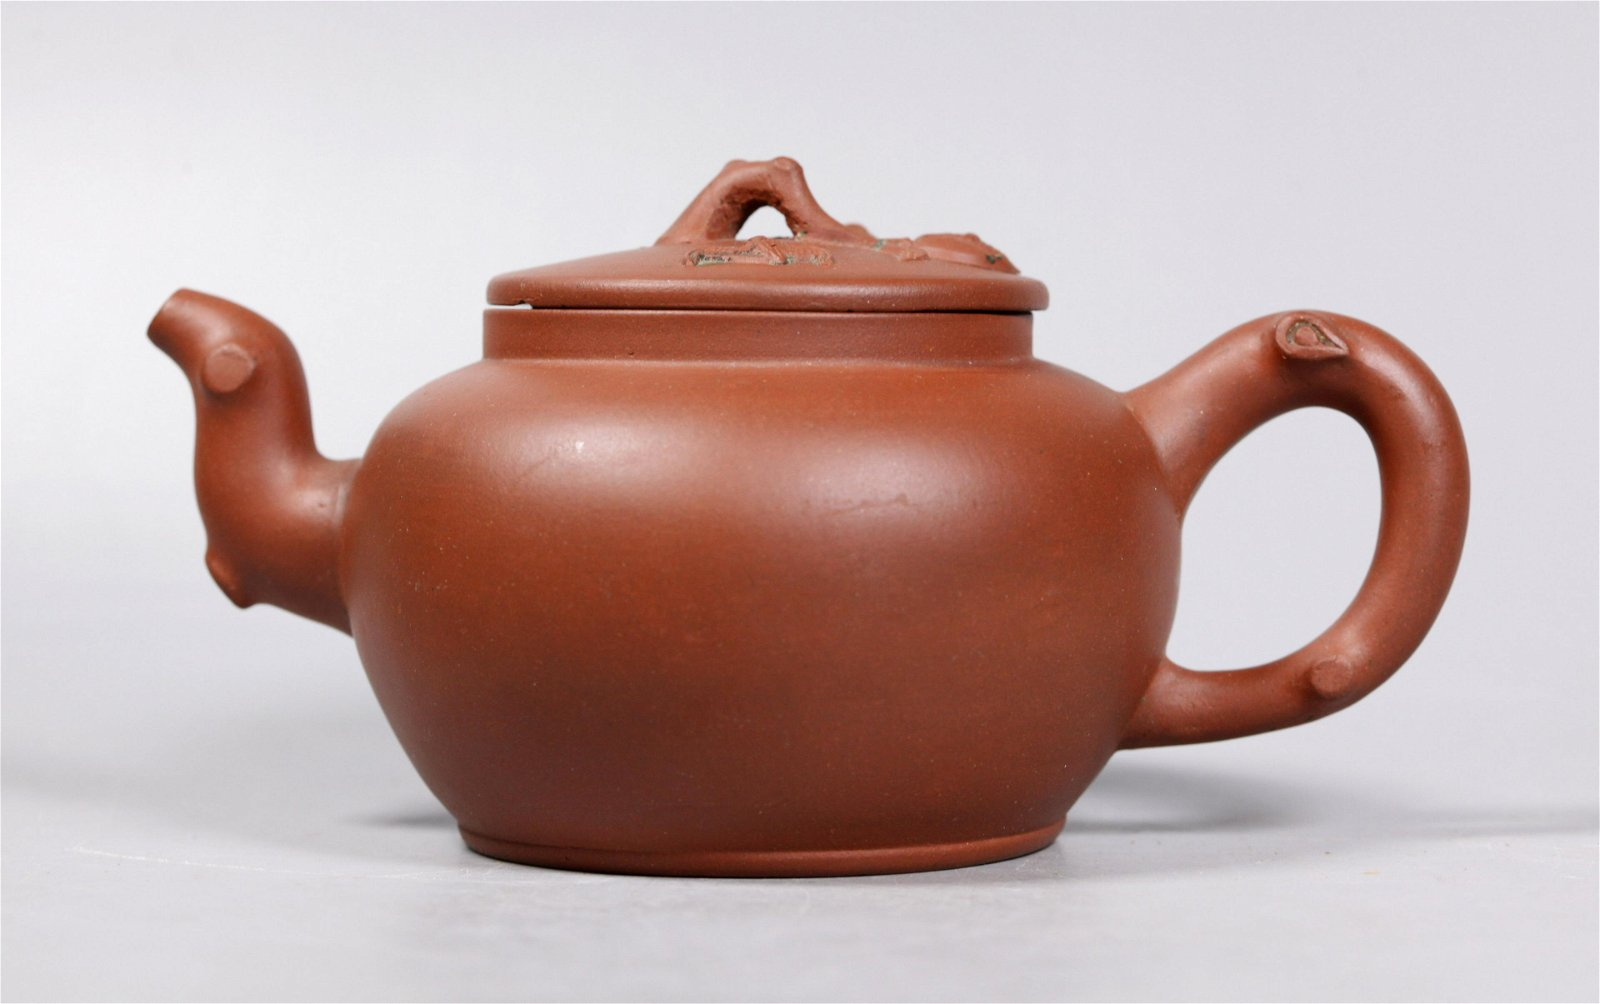 Chinese 19/20 Century Yixing Peach & Bat Teapot